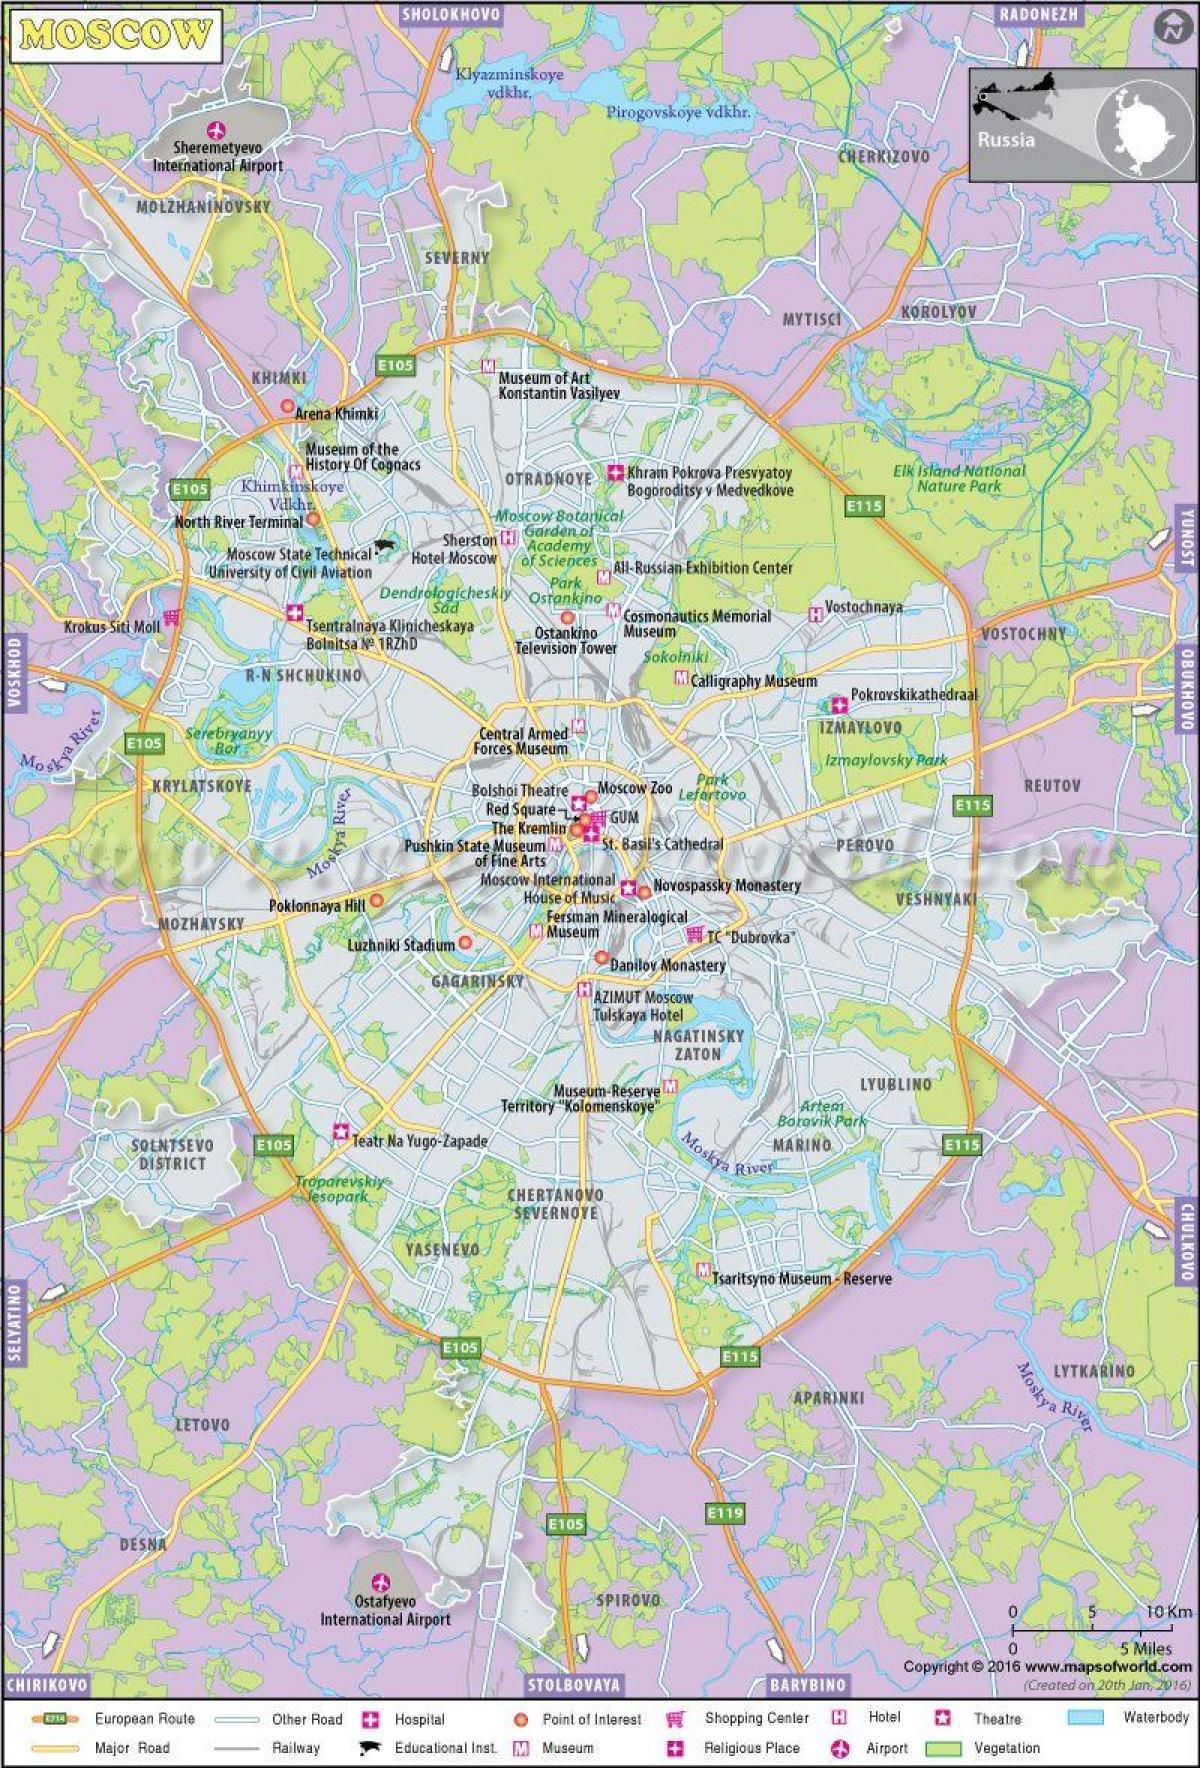 kart over moskva Moskva id kart   Kart over Moskva id (Russland) kart over moskva